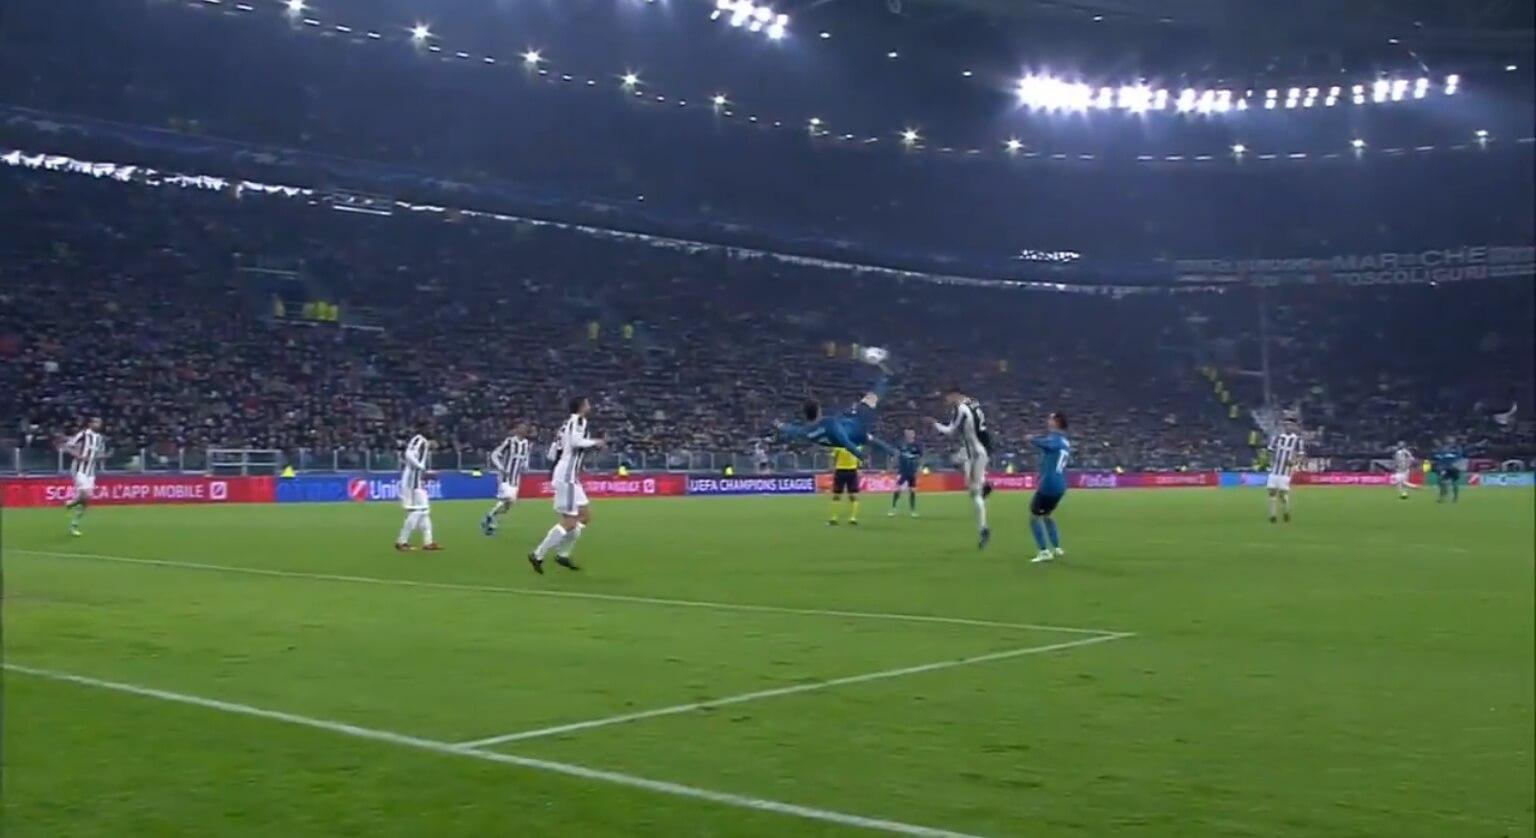 ronaldo scores goal